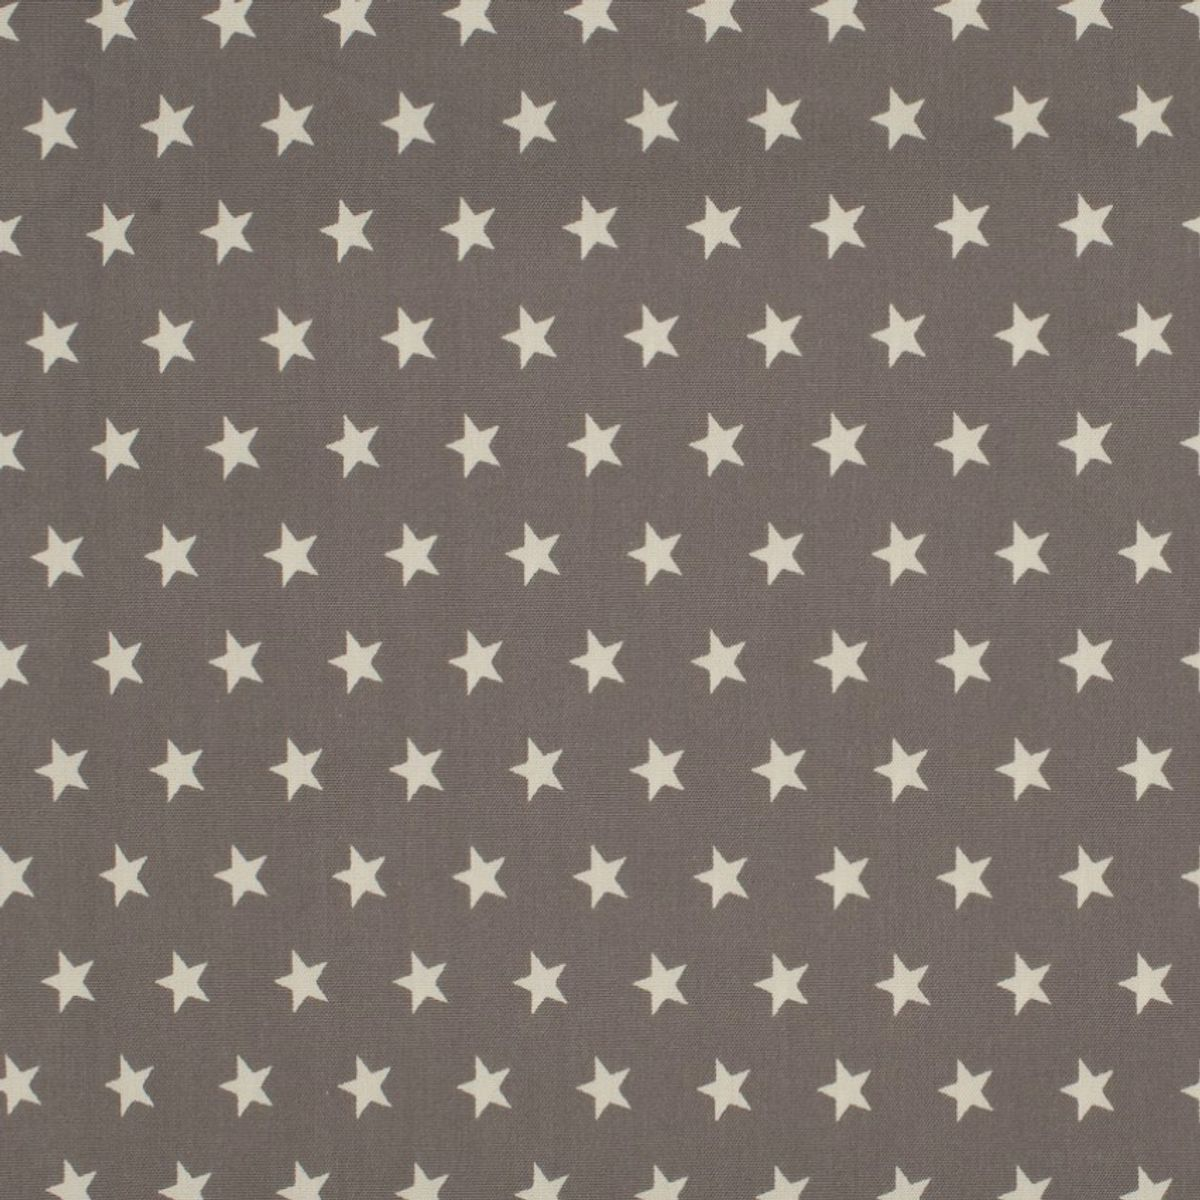 Tissus coton étoiles - Taupe et blanc